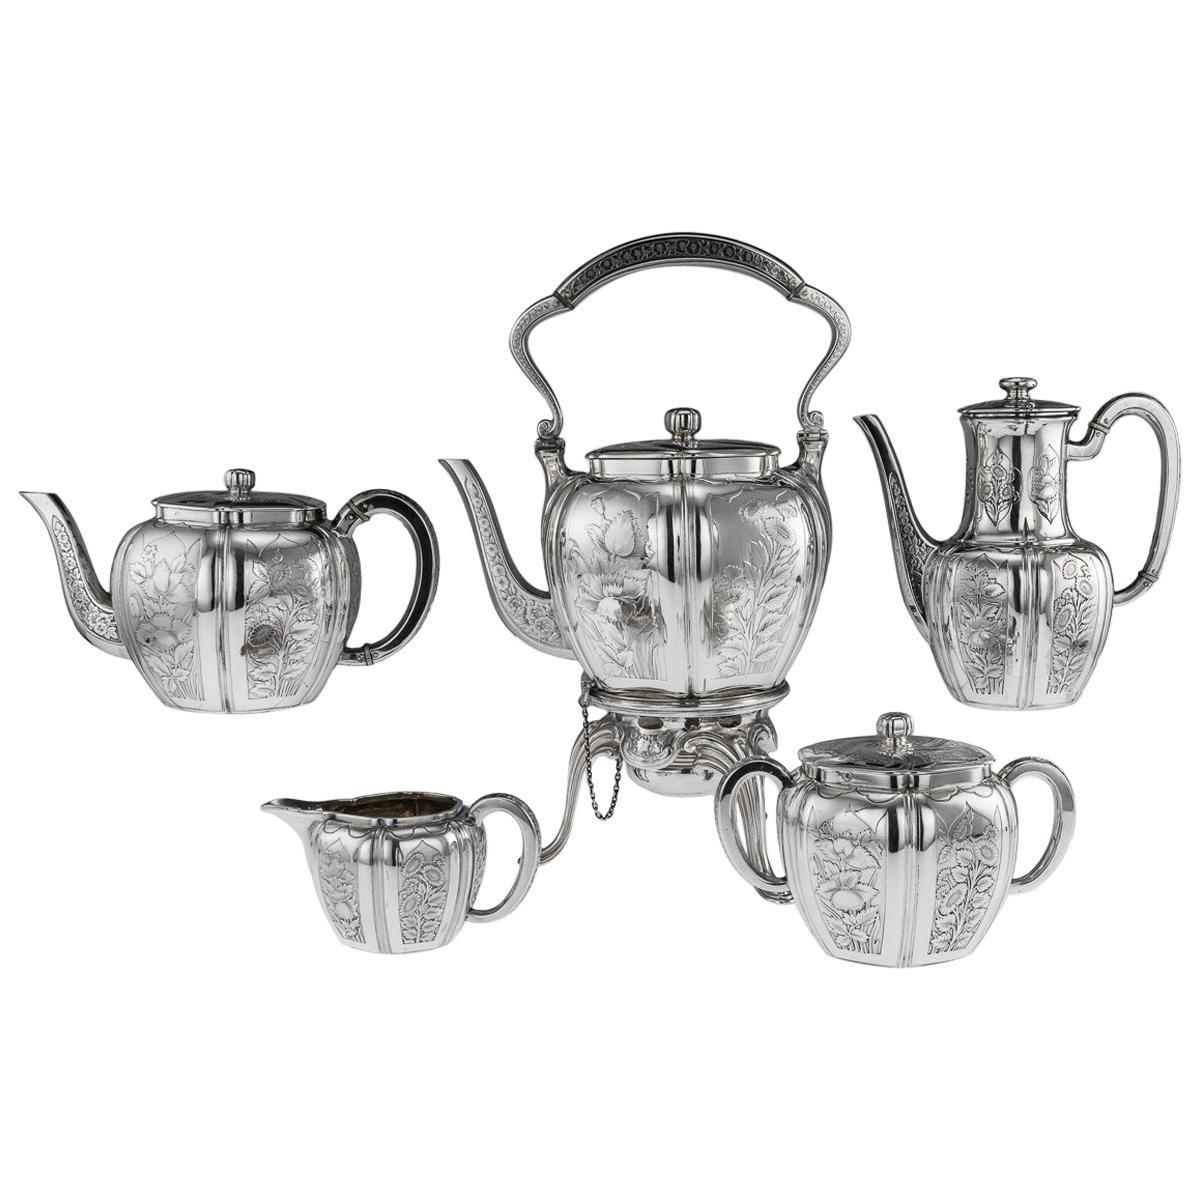 Antique 19th Century French Solid Silver Five Piece Tea Service Odiot circa 1880